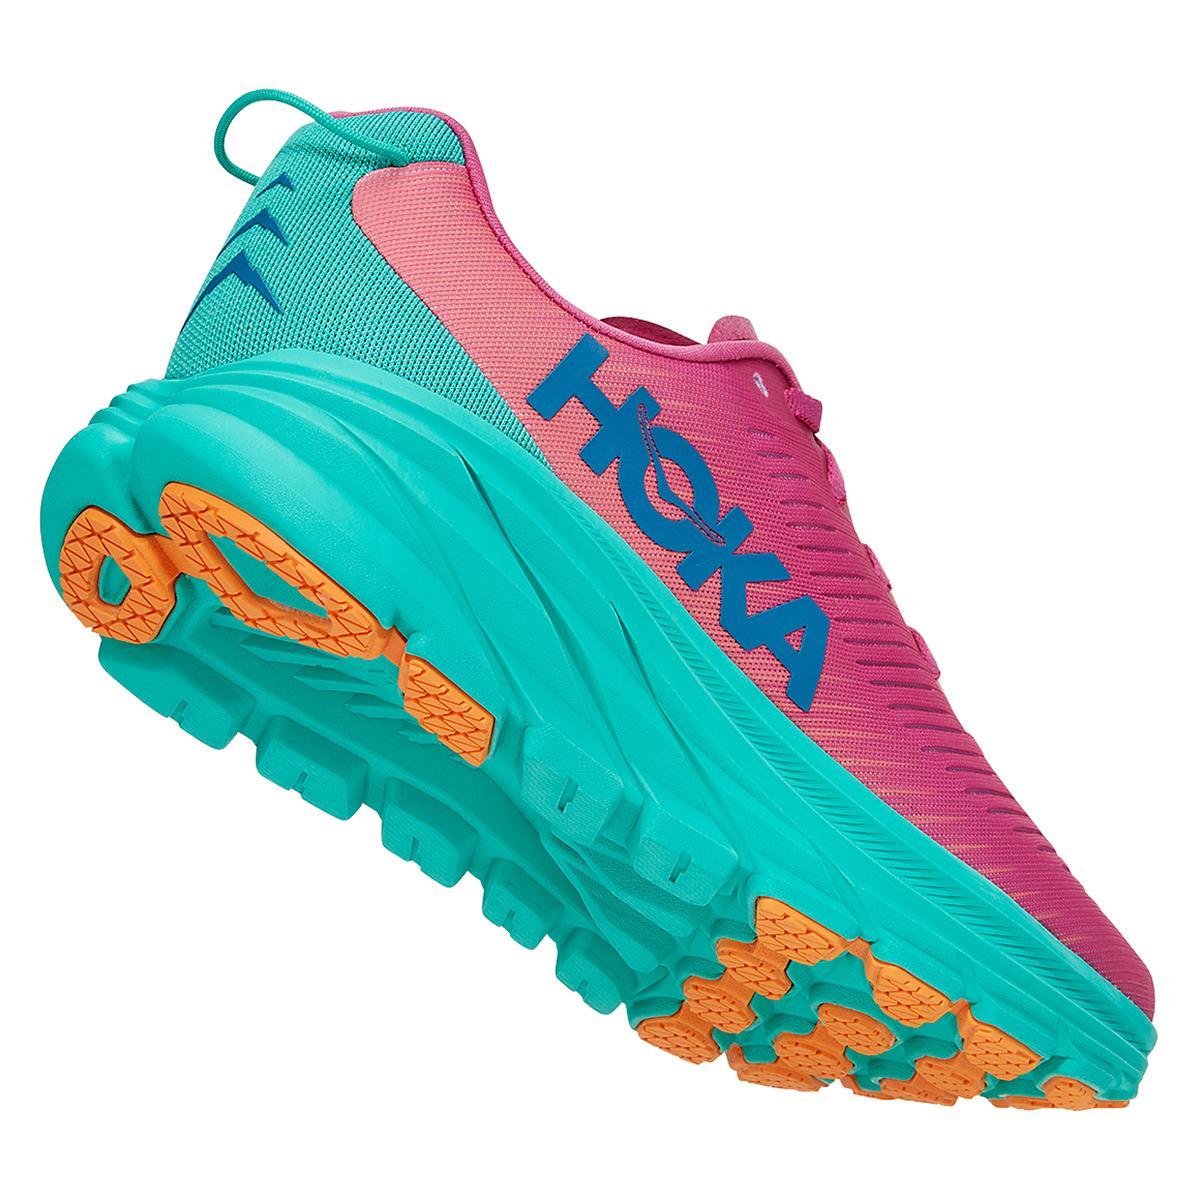 Women's Hoka One One Rincon 3 Running Shoe - Color: Phlox Pink/Atlantis - Size: 5 - Width: Regular, Phlox Pink/Atlantis, large, image 3